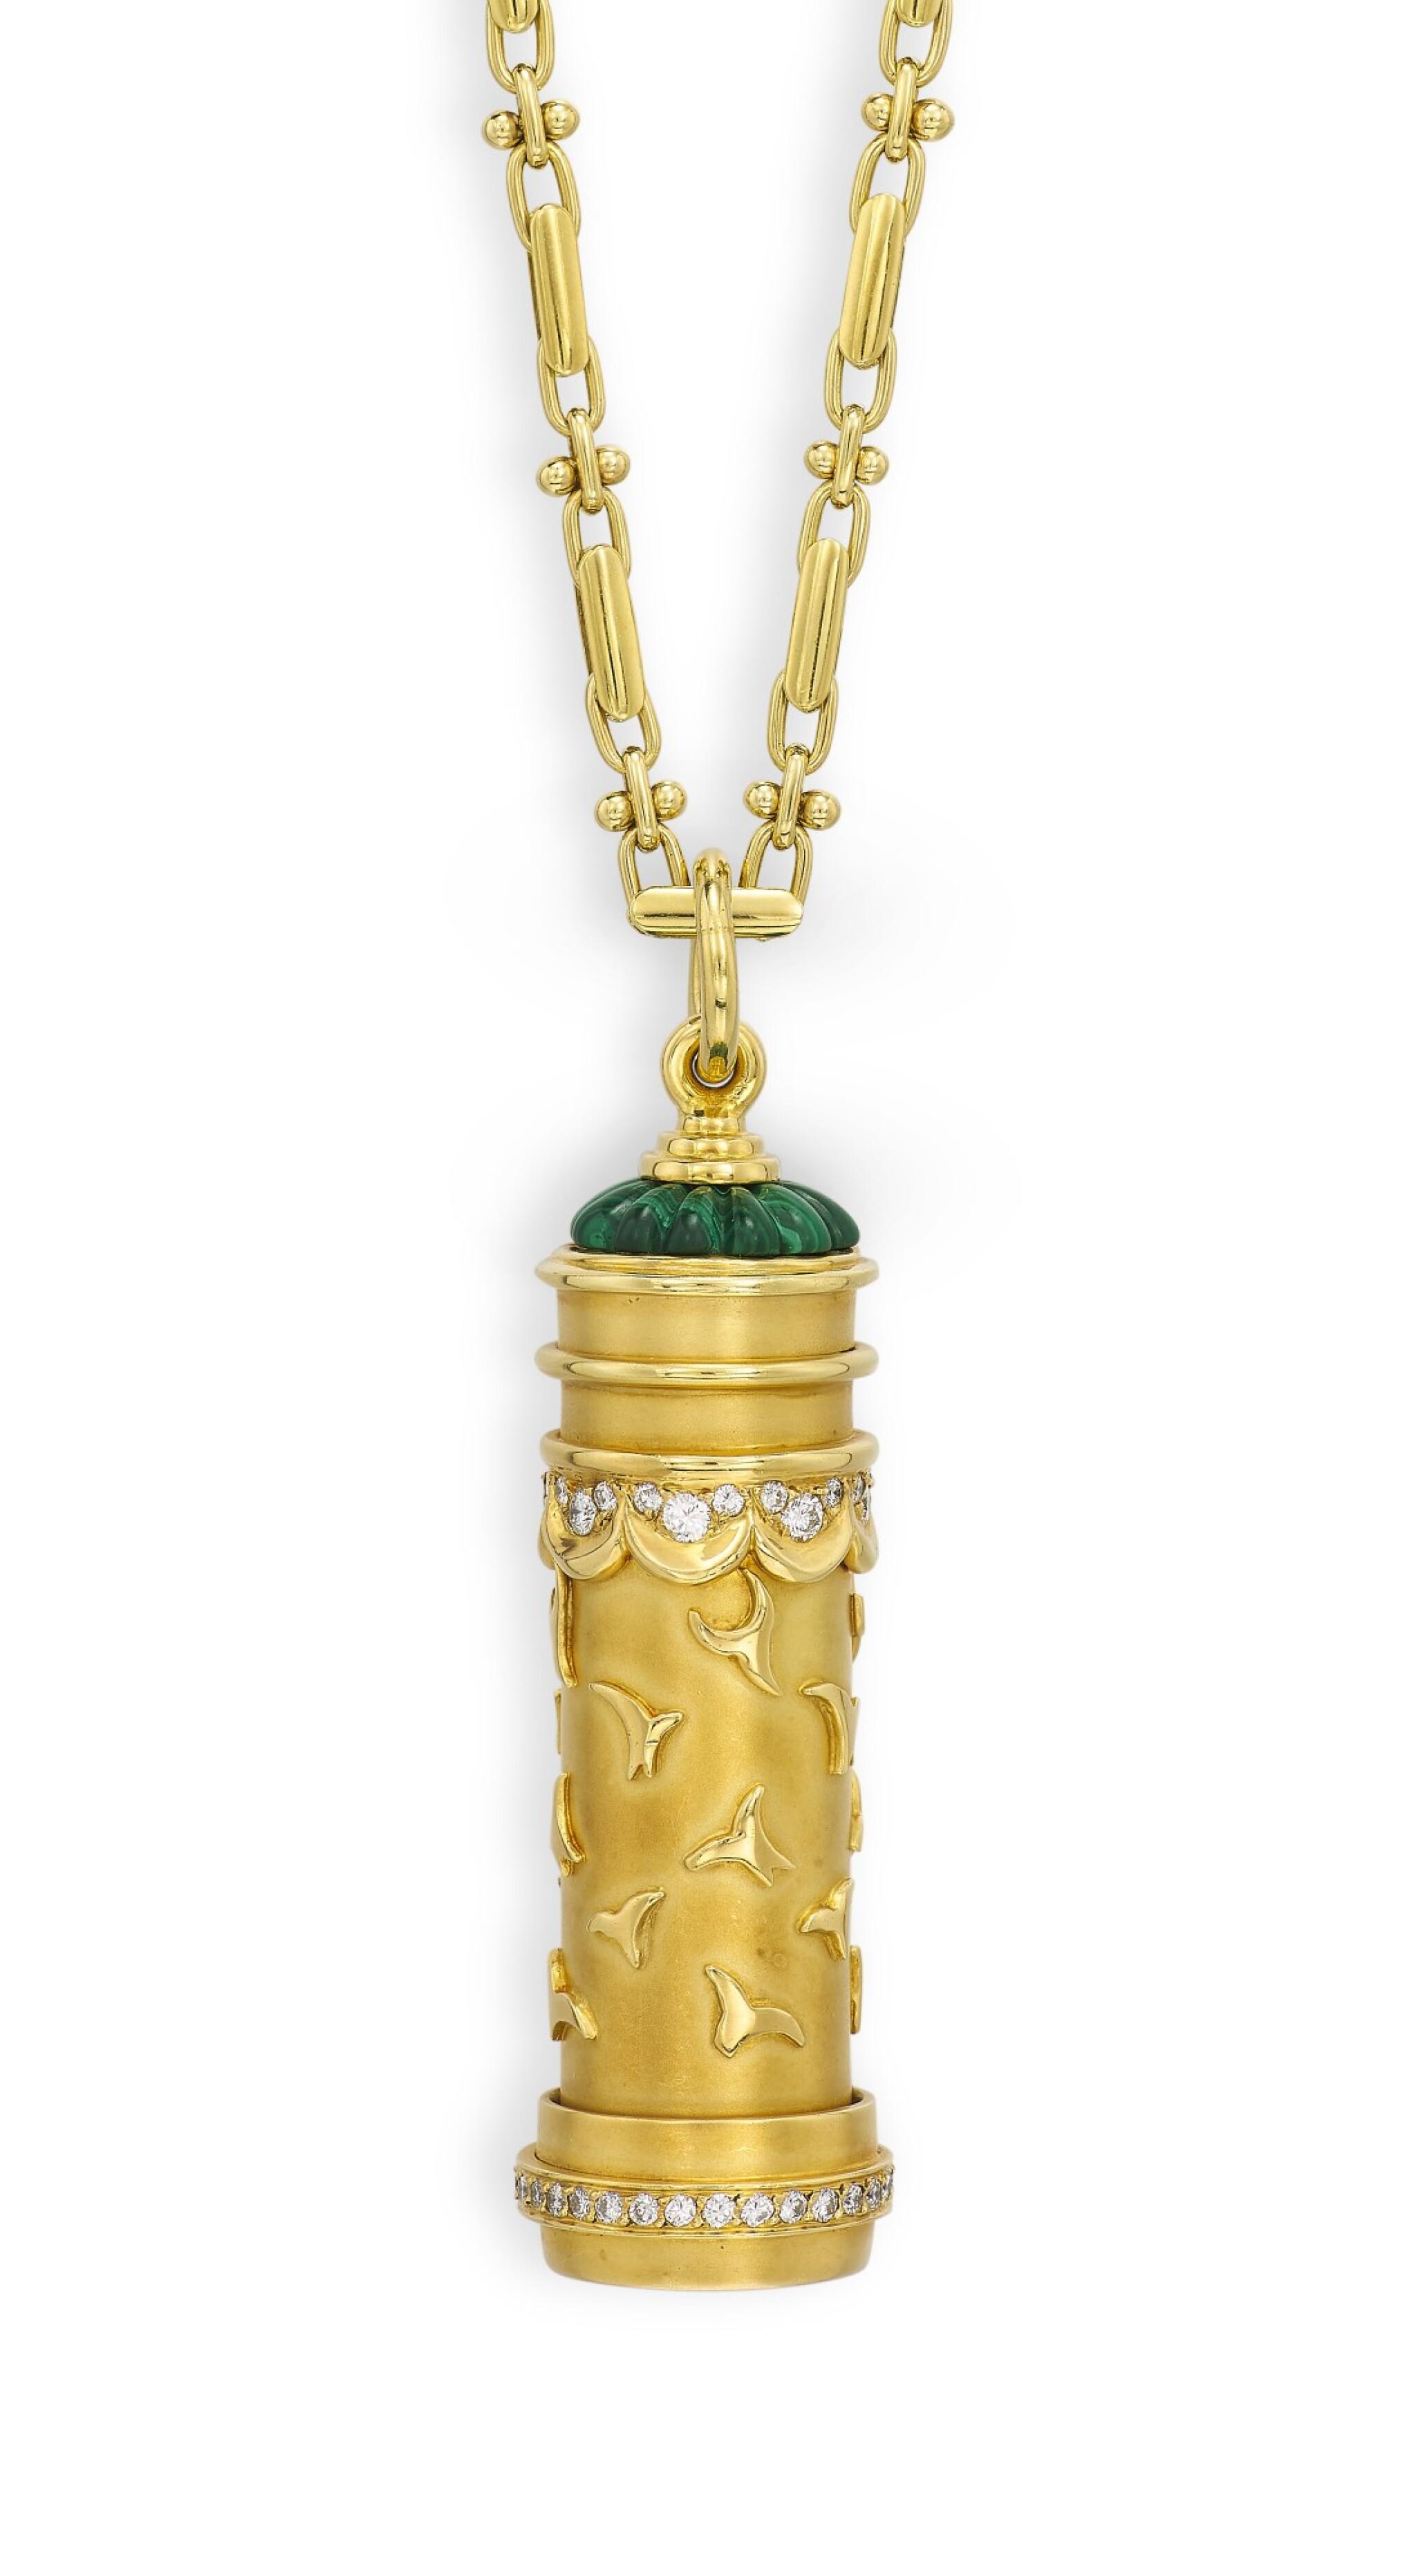 HARRY WINSTON   GOLD, DIAMOND AND GEM SET NOVELTY KALEIDOSCOPE PENDANT   海瑞溫斯頓   18K黃金 配 鑽石 及 寶石 萬花筒 掛墜